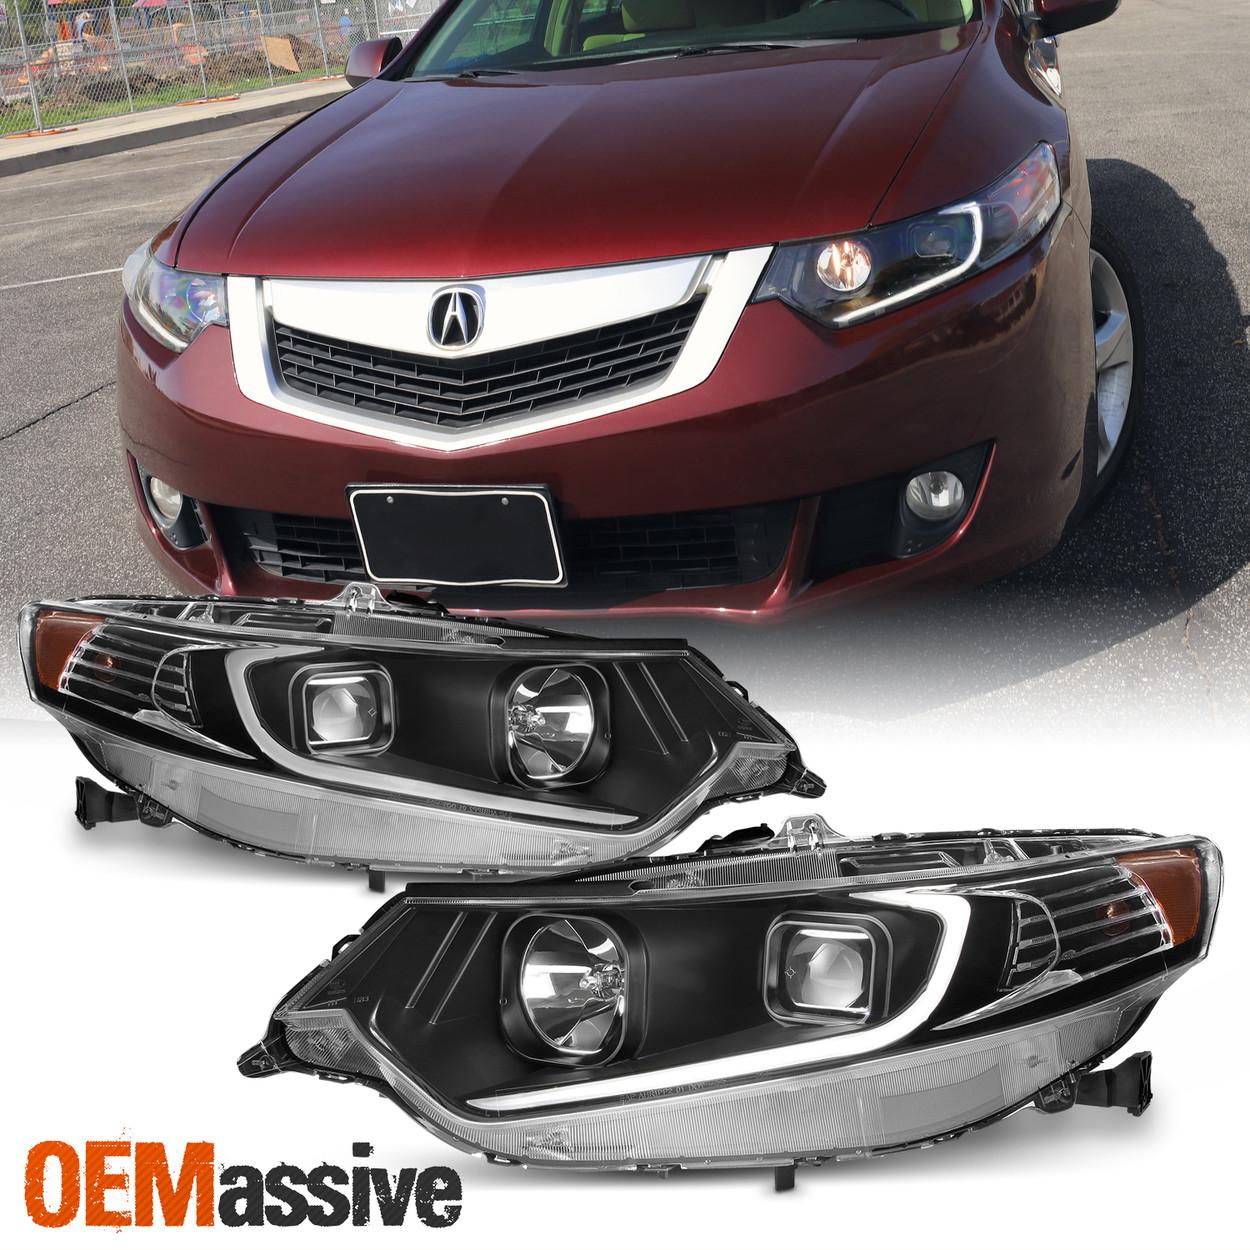 2009 2014 Acura Tsx Led Drl Tube Projector Black Headlights Headlamps Left Right Oemassive